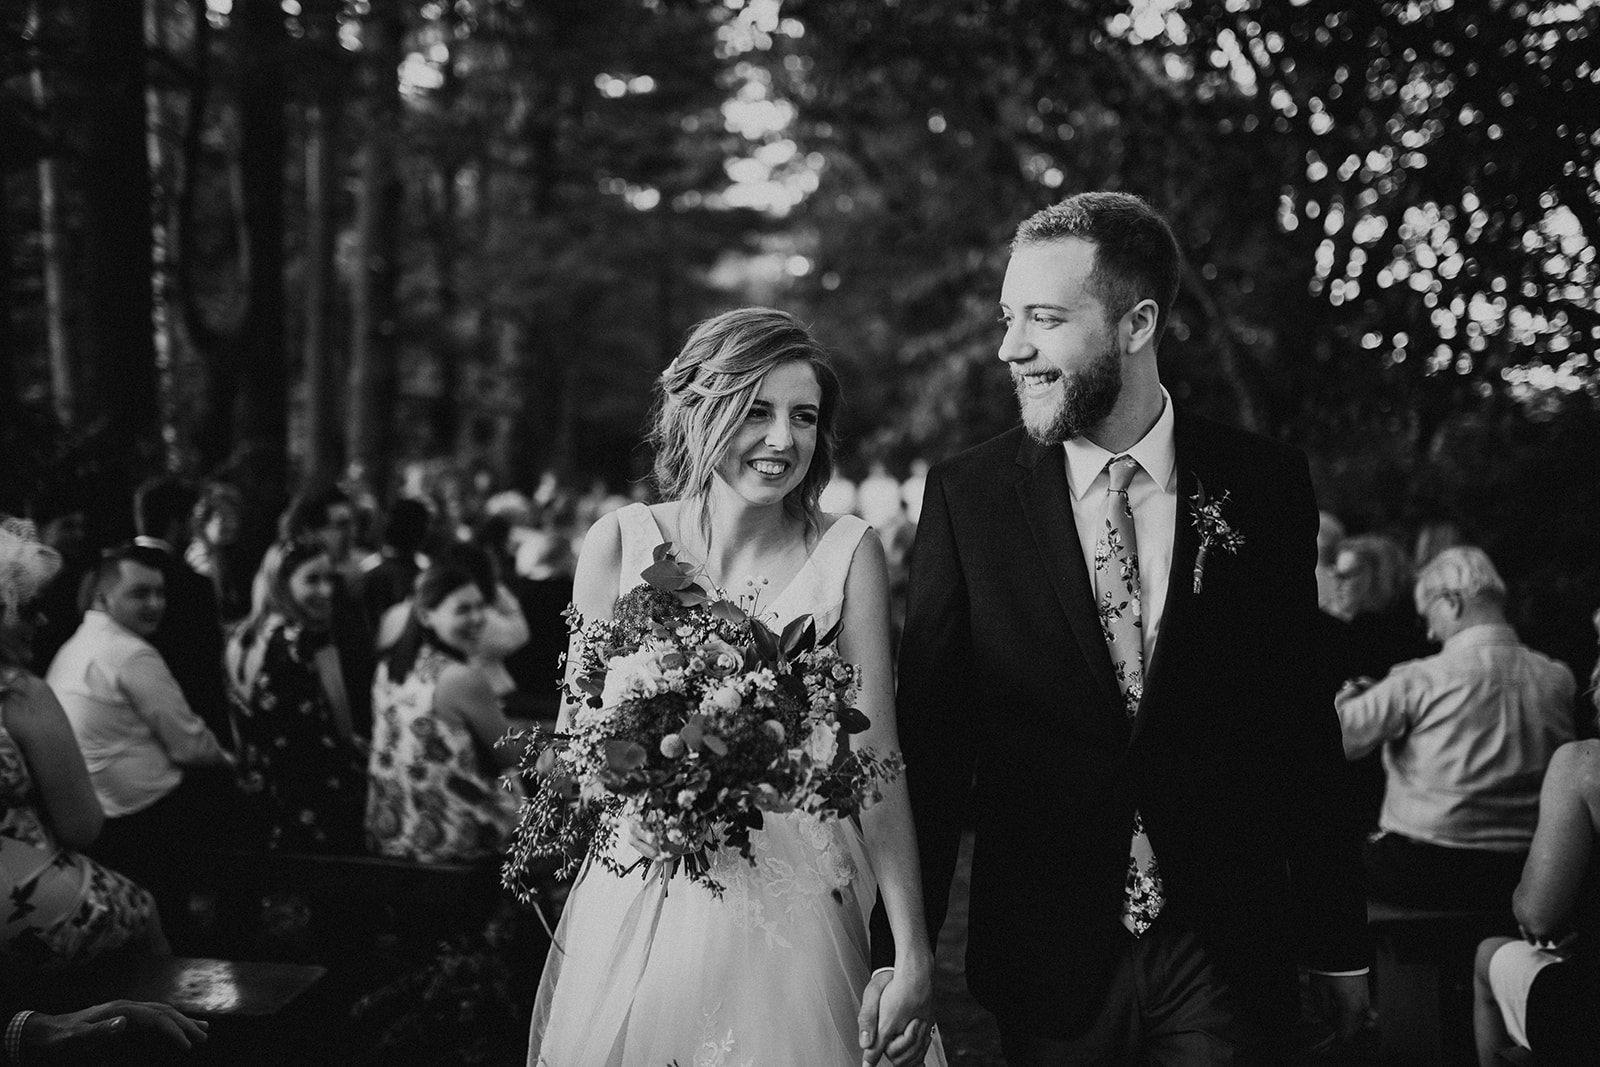 camp_wokanda_peoria_illinois_wedding_photographer_wright_photographs_bliese_0288.jpg